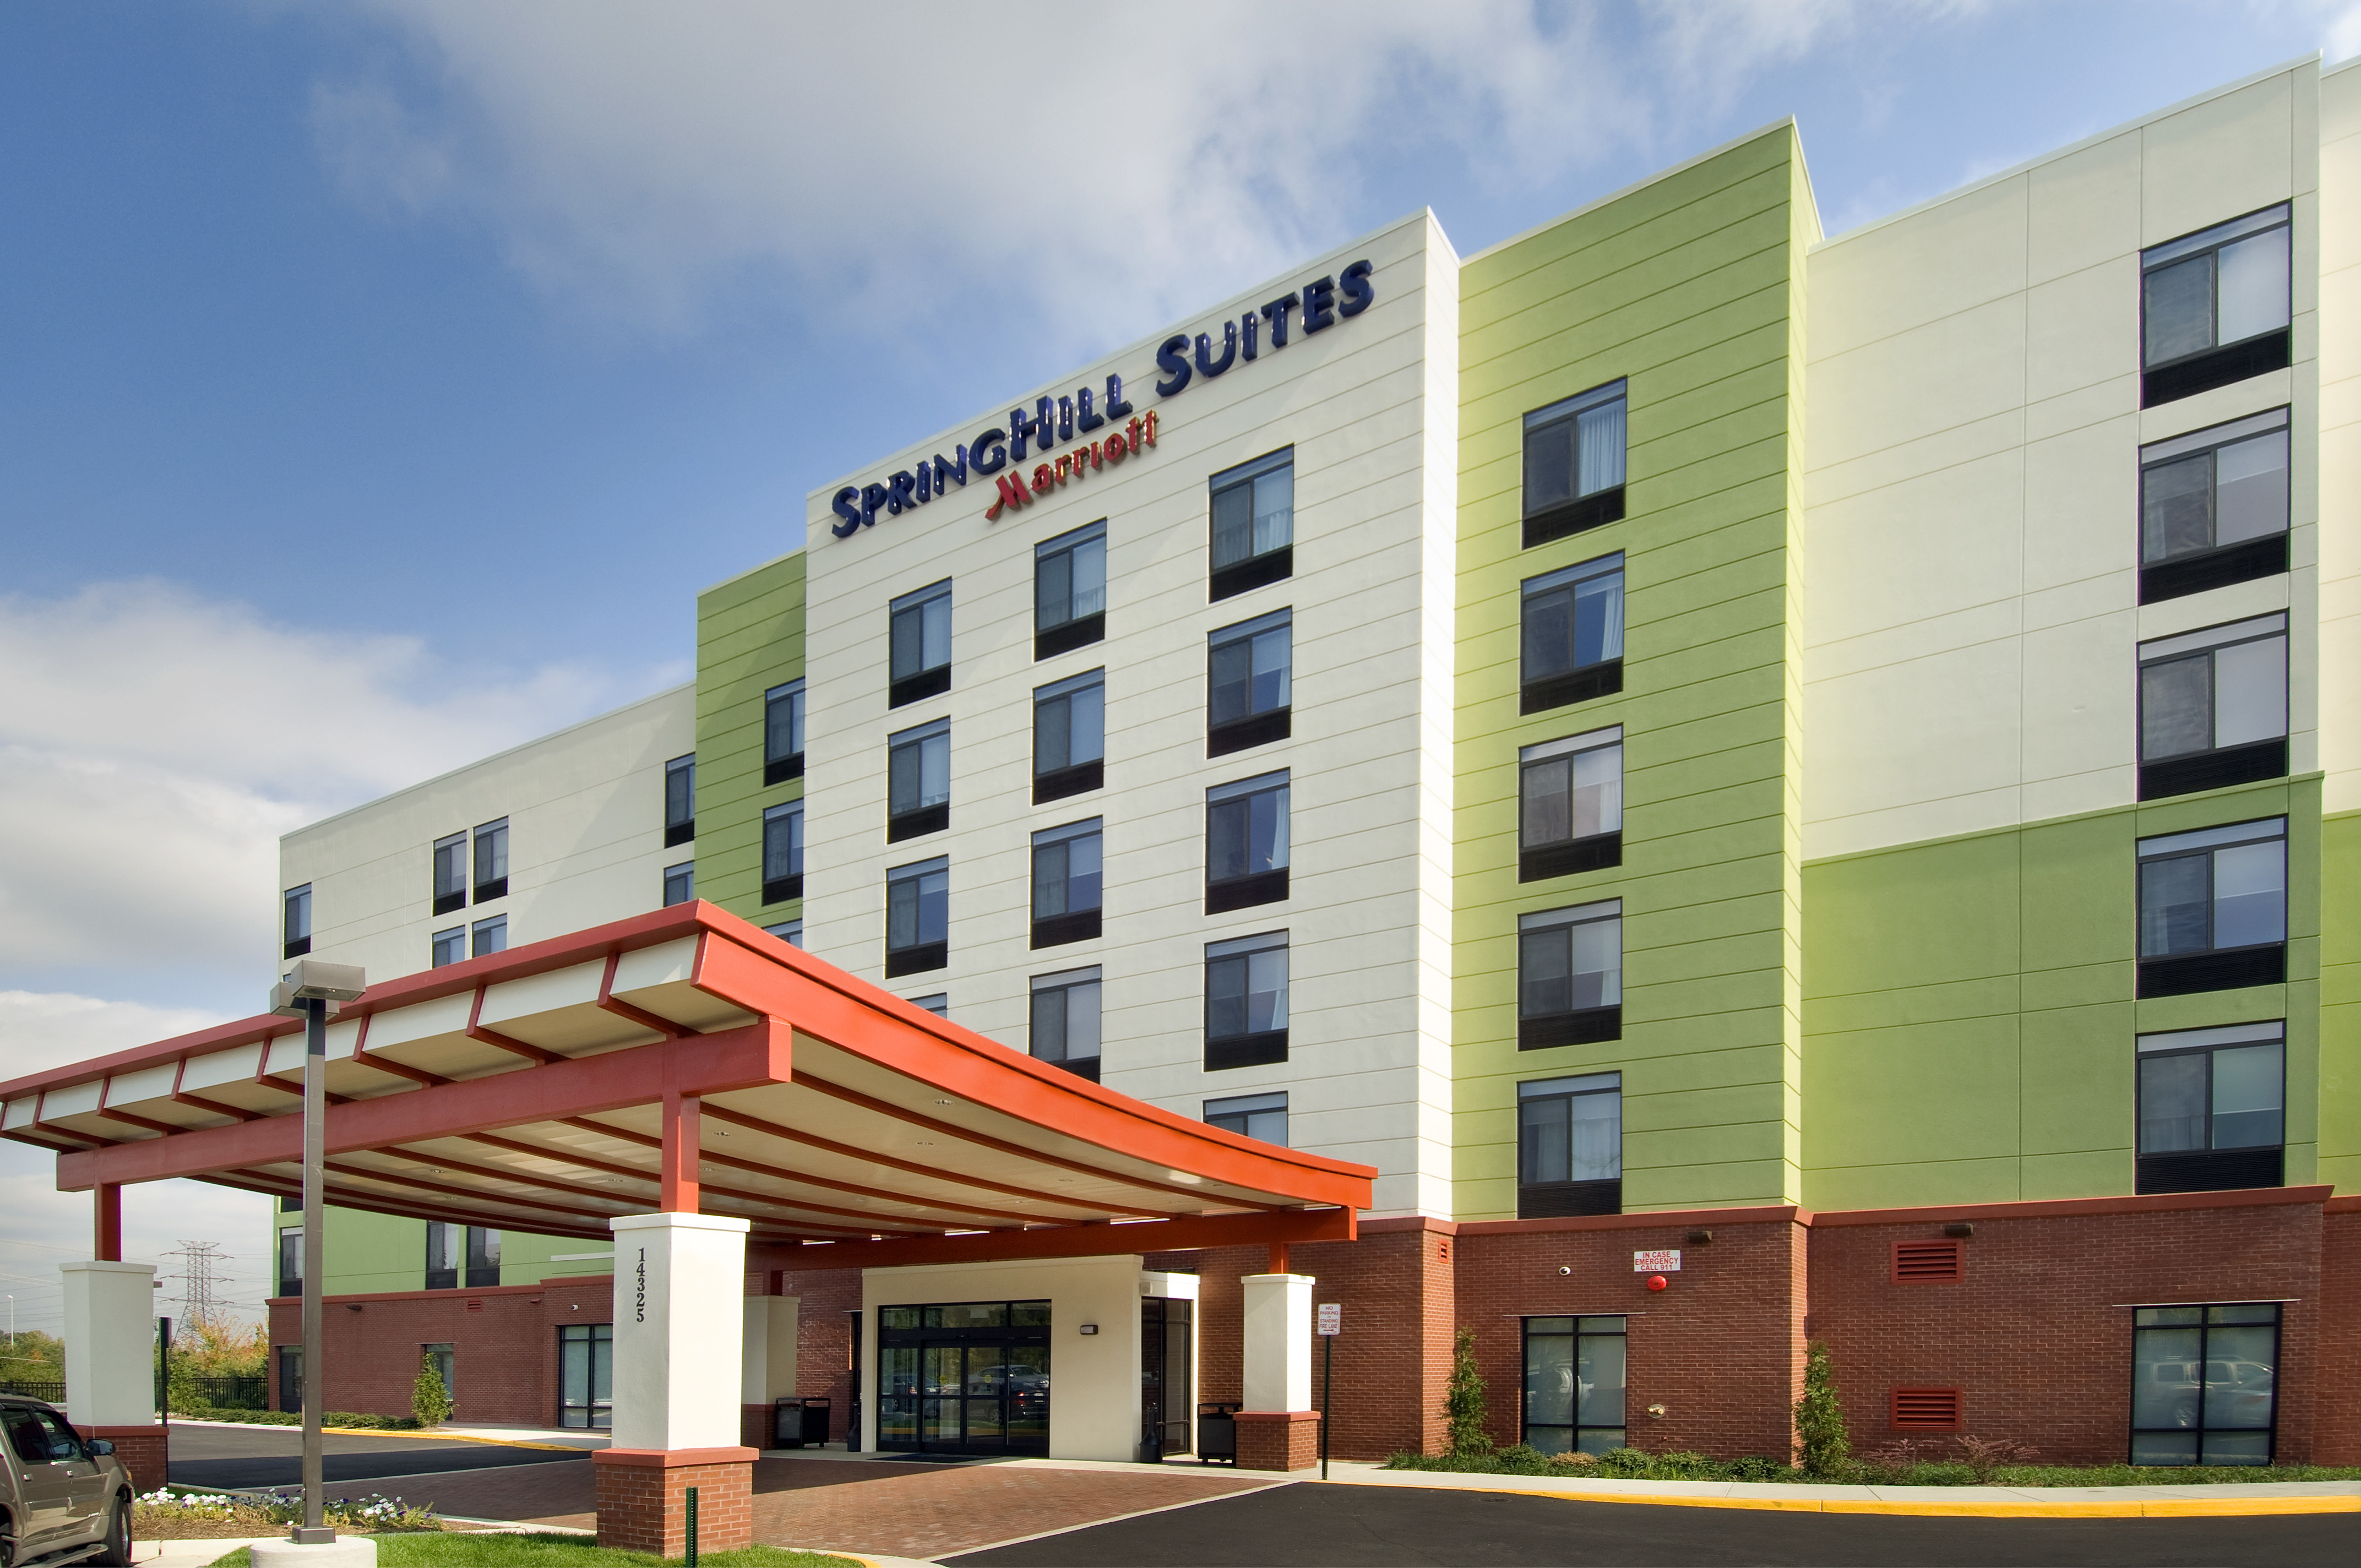 SpringHill Suites by Marriott Potomac Mills Woodbridge image 1